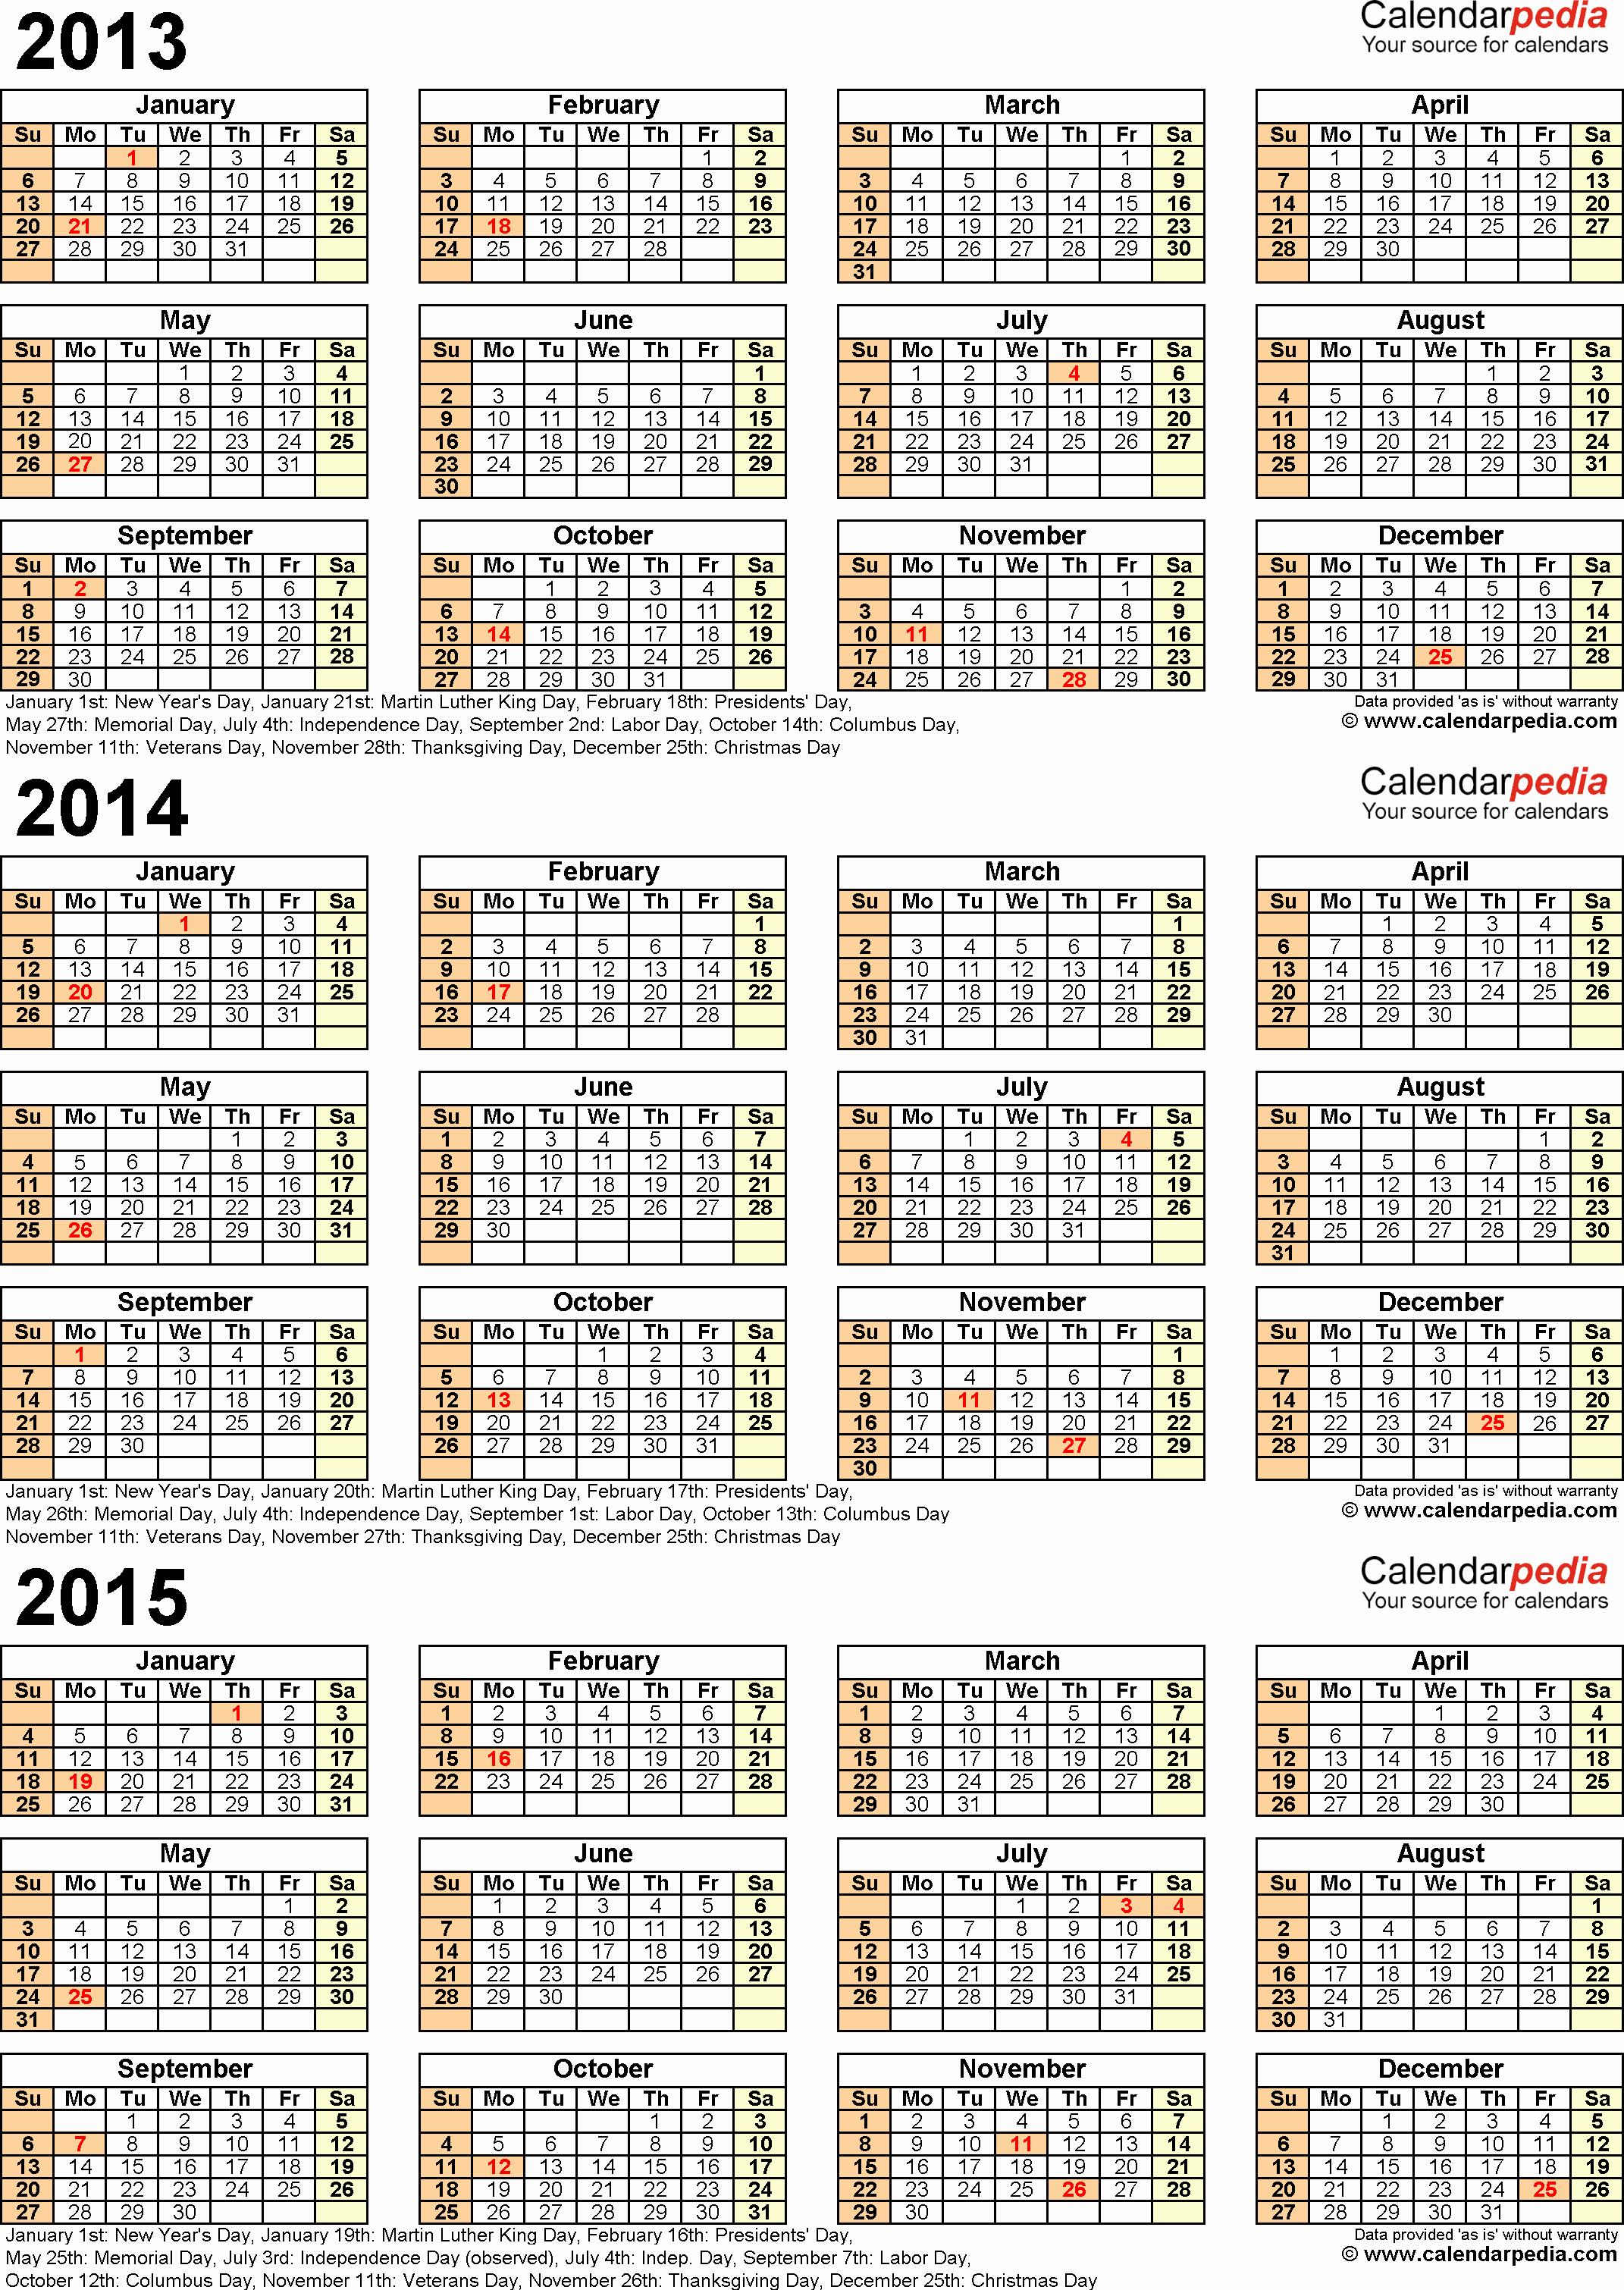 Printable 3 Month Calendar 2015 Awesome 2013 2014 2015 Calendar 2 Three Year Printable Pdf Calendars